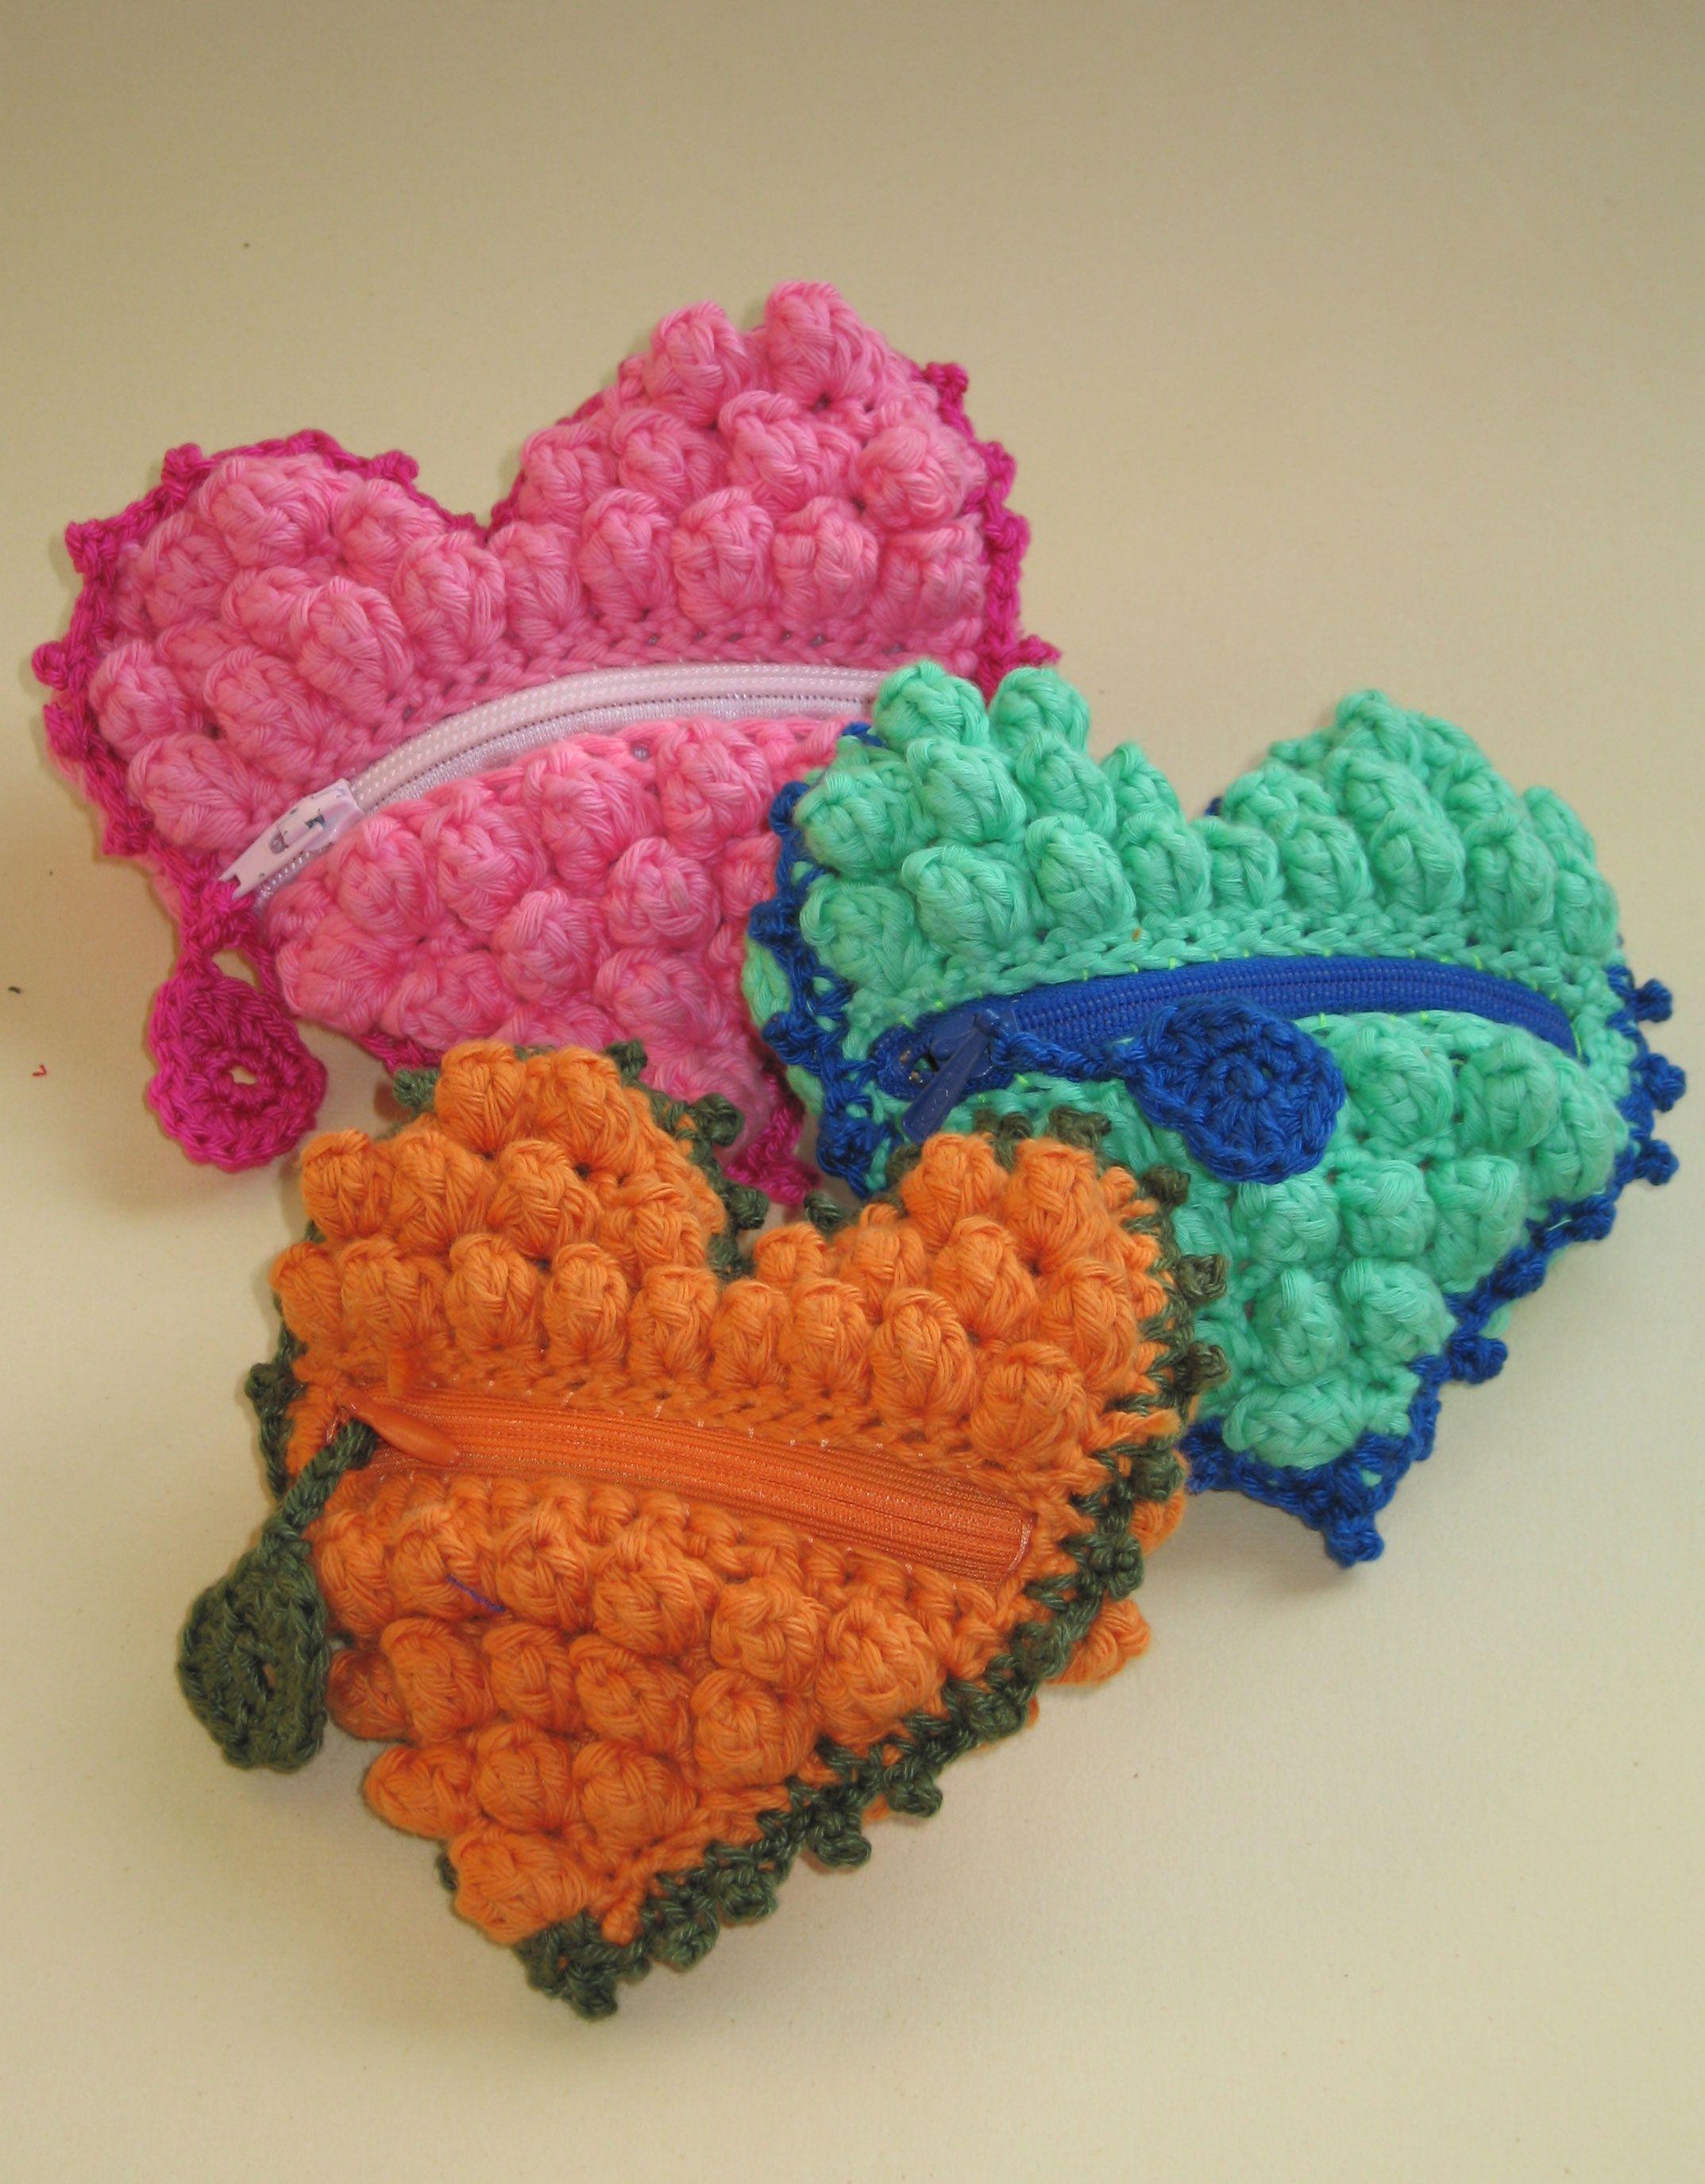 Monederos con forma de corazón | Crochet | Pinterest | Herzchen